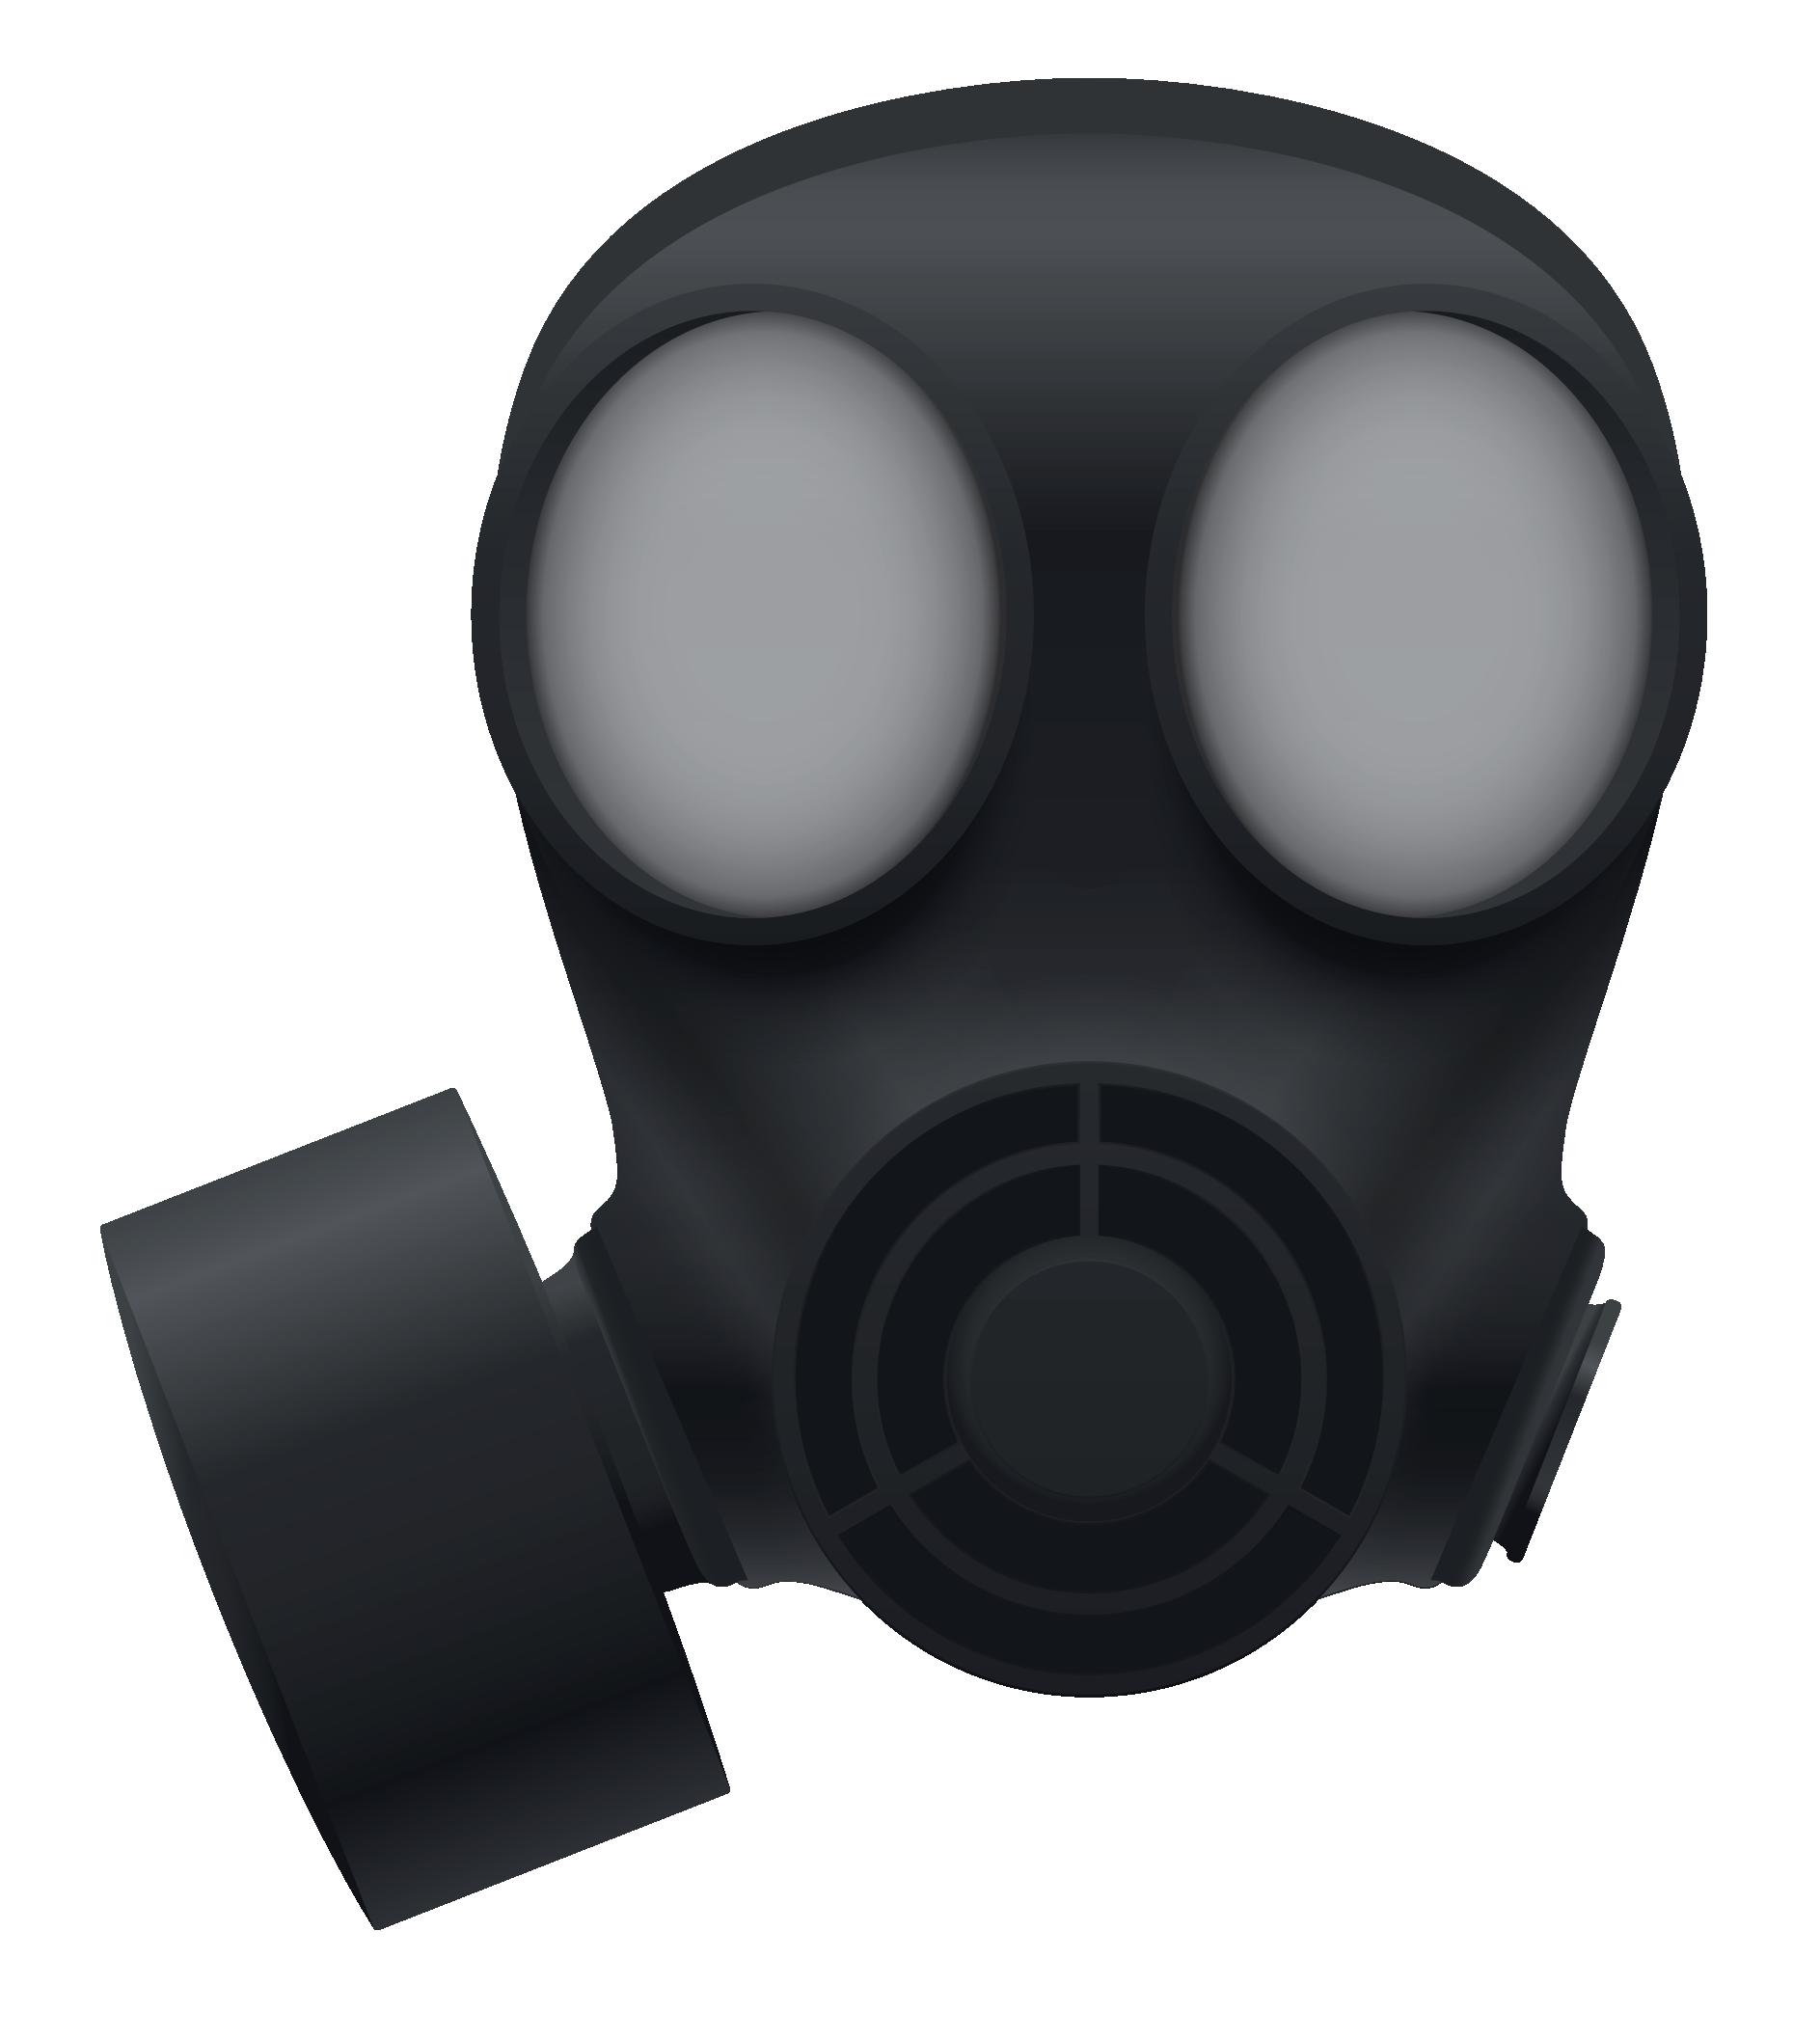 Gas Mask Vector PNG Transparent Image - Mask PNG